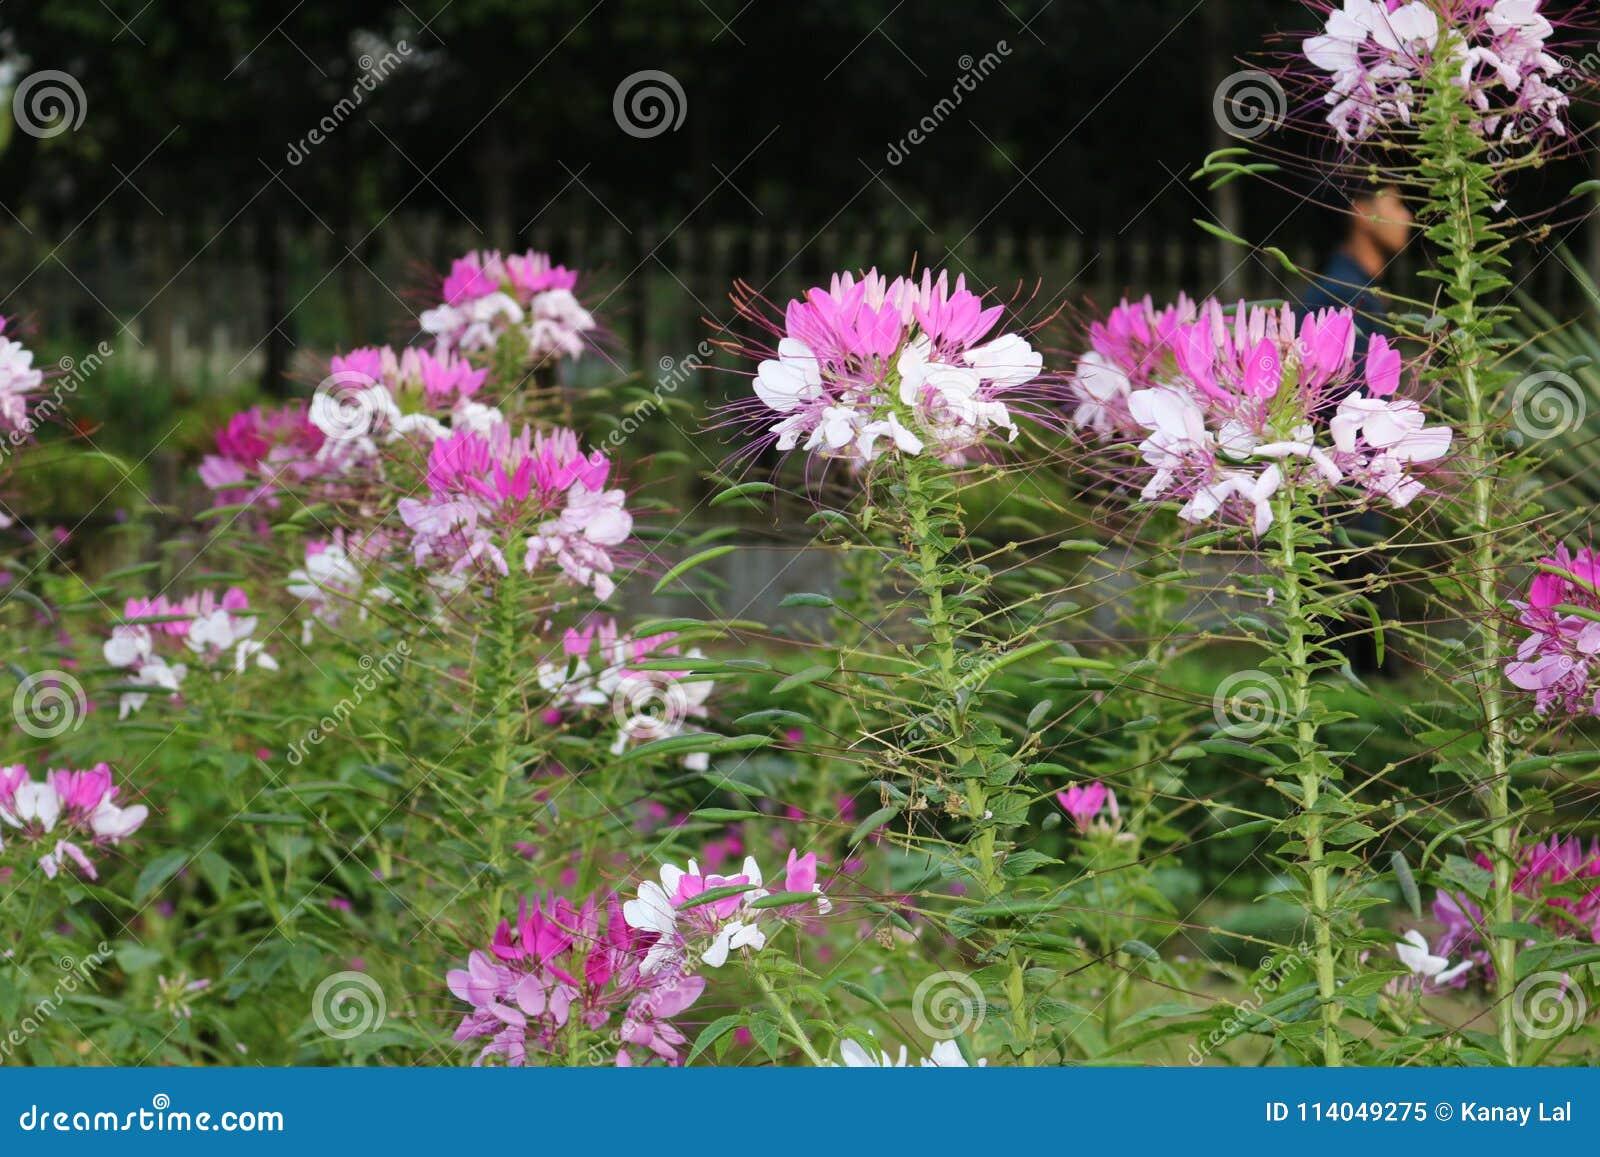 Beautiful white grass flower of bangladeshi garden stock image beautiful white grass flower of bangladeshi garden mightylinksfo